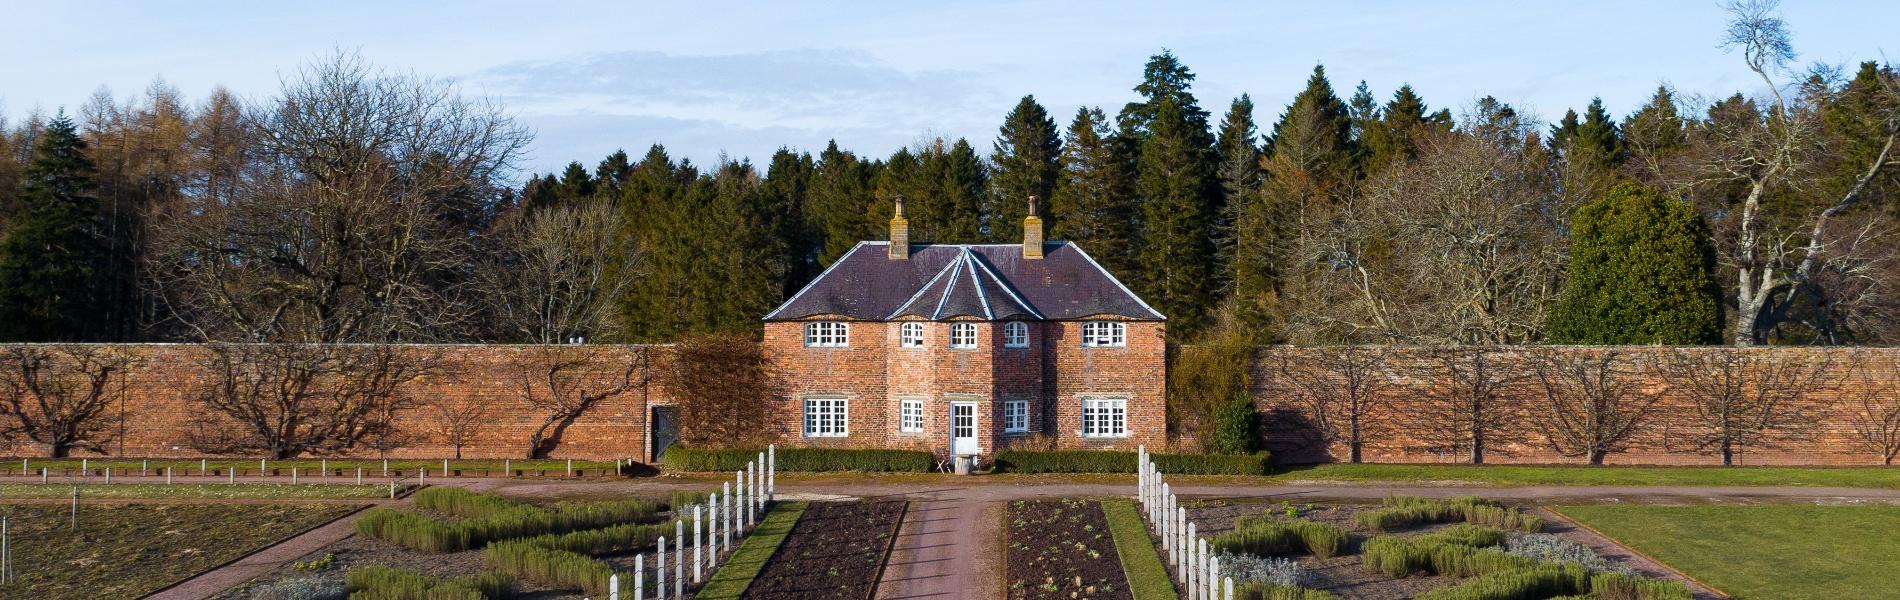 Cottage header Gordon Castle PROJECT